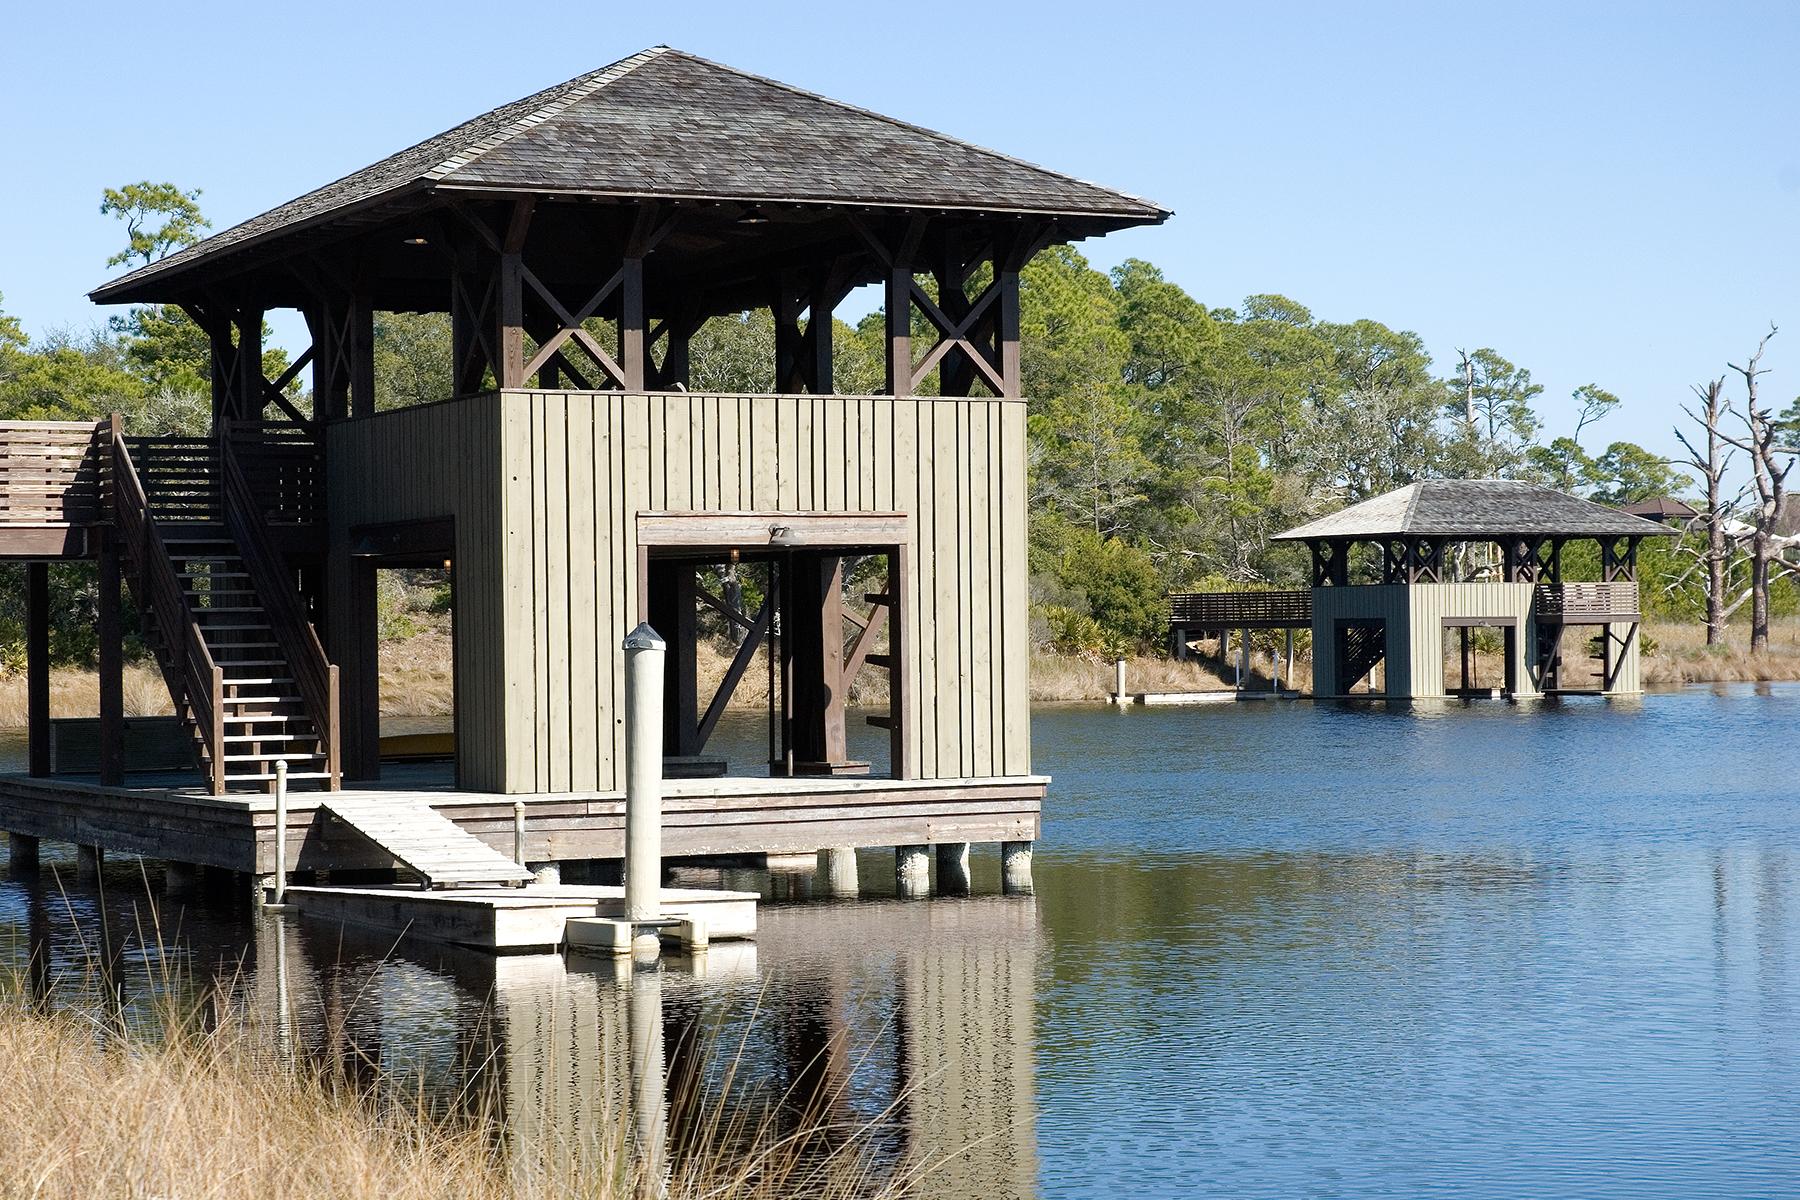 draper lake coastal village scenic sotheby s international realty